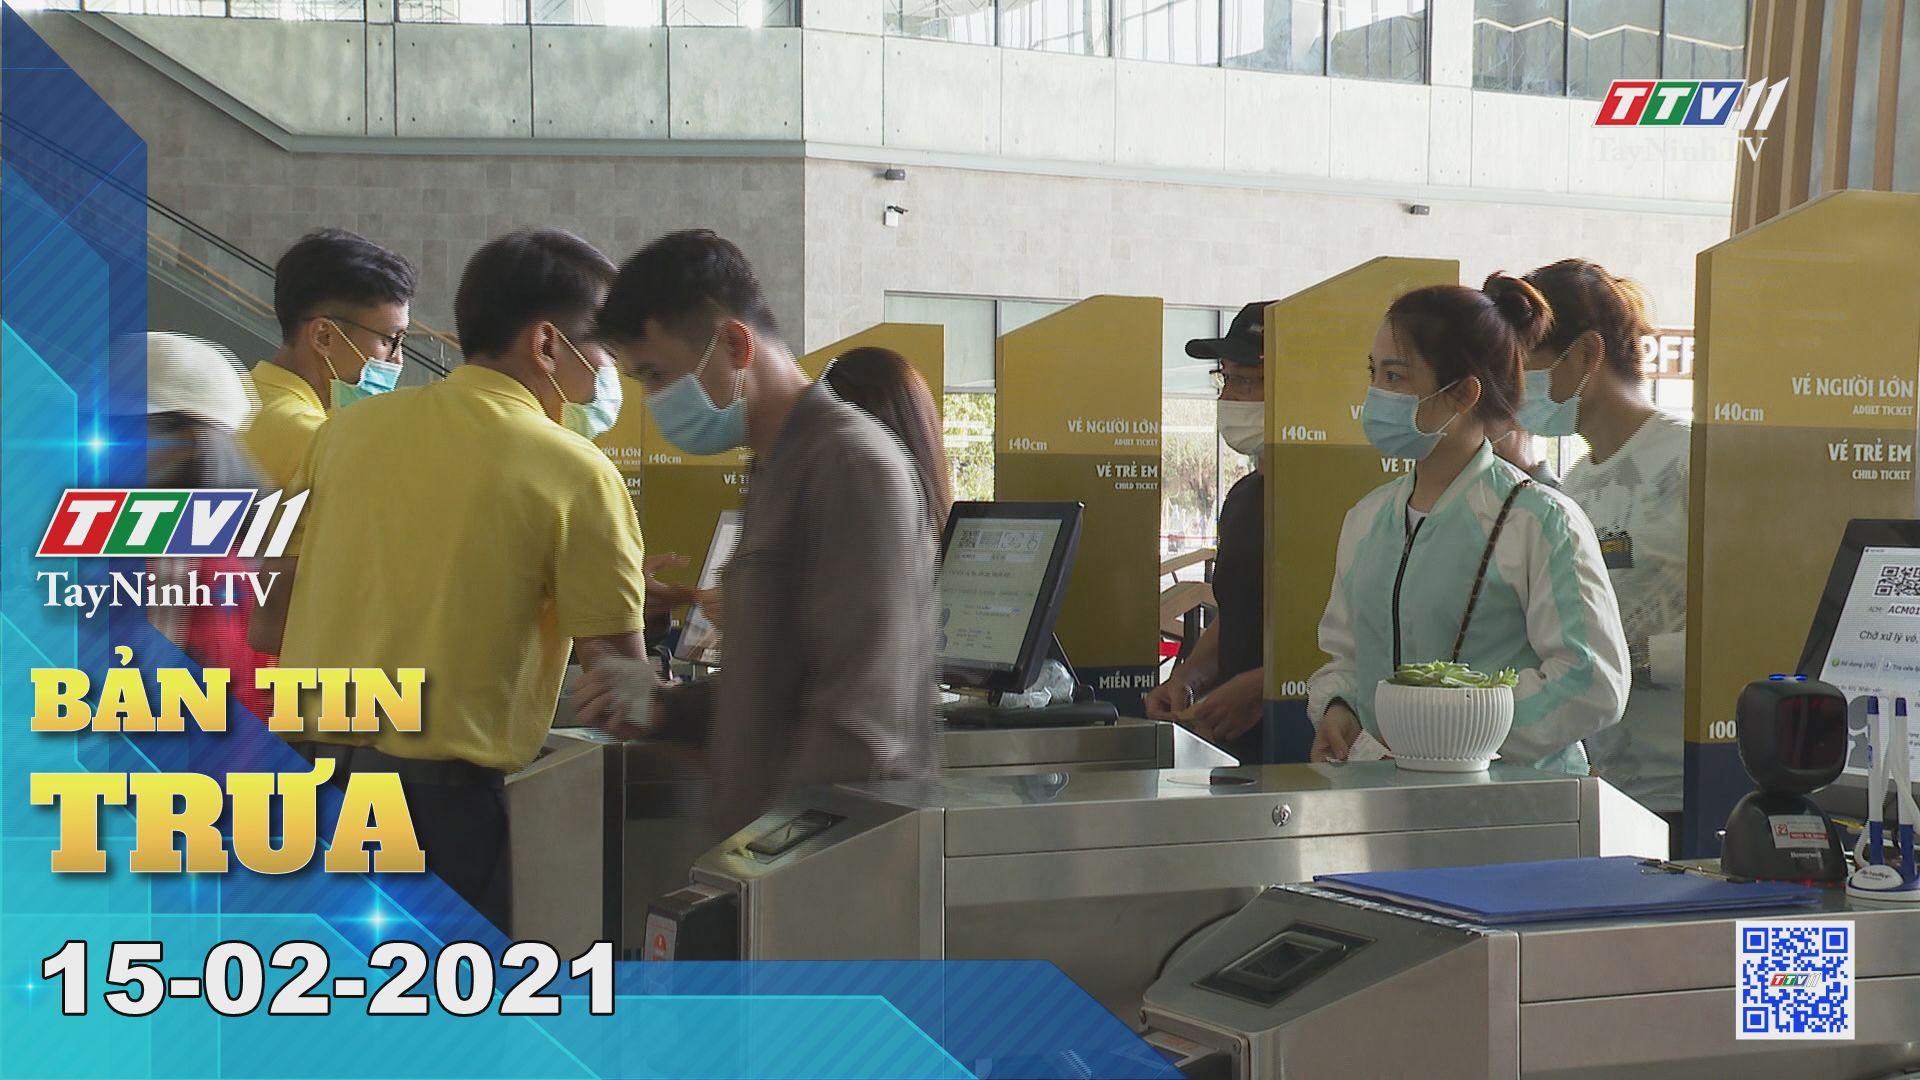 Bản tin trưa 15-02-2021 | Tin tức hôm nay | TayNinhTV